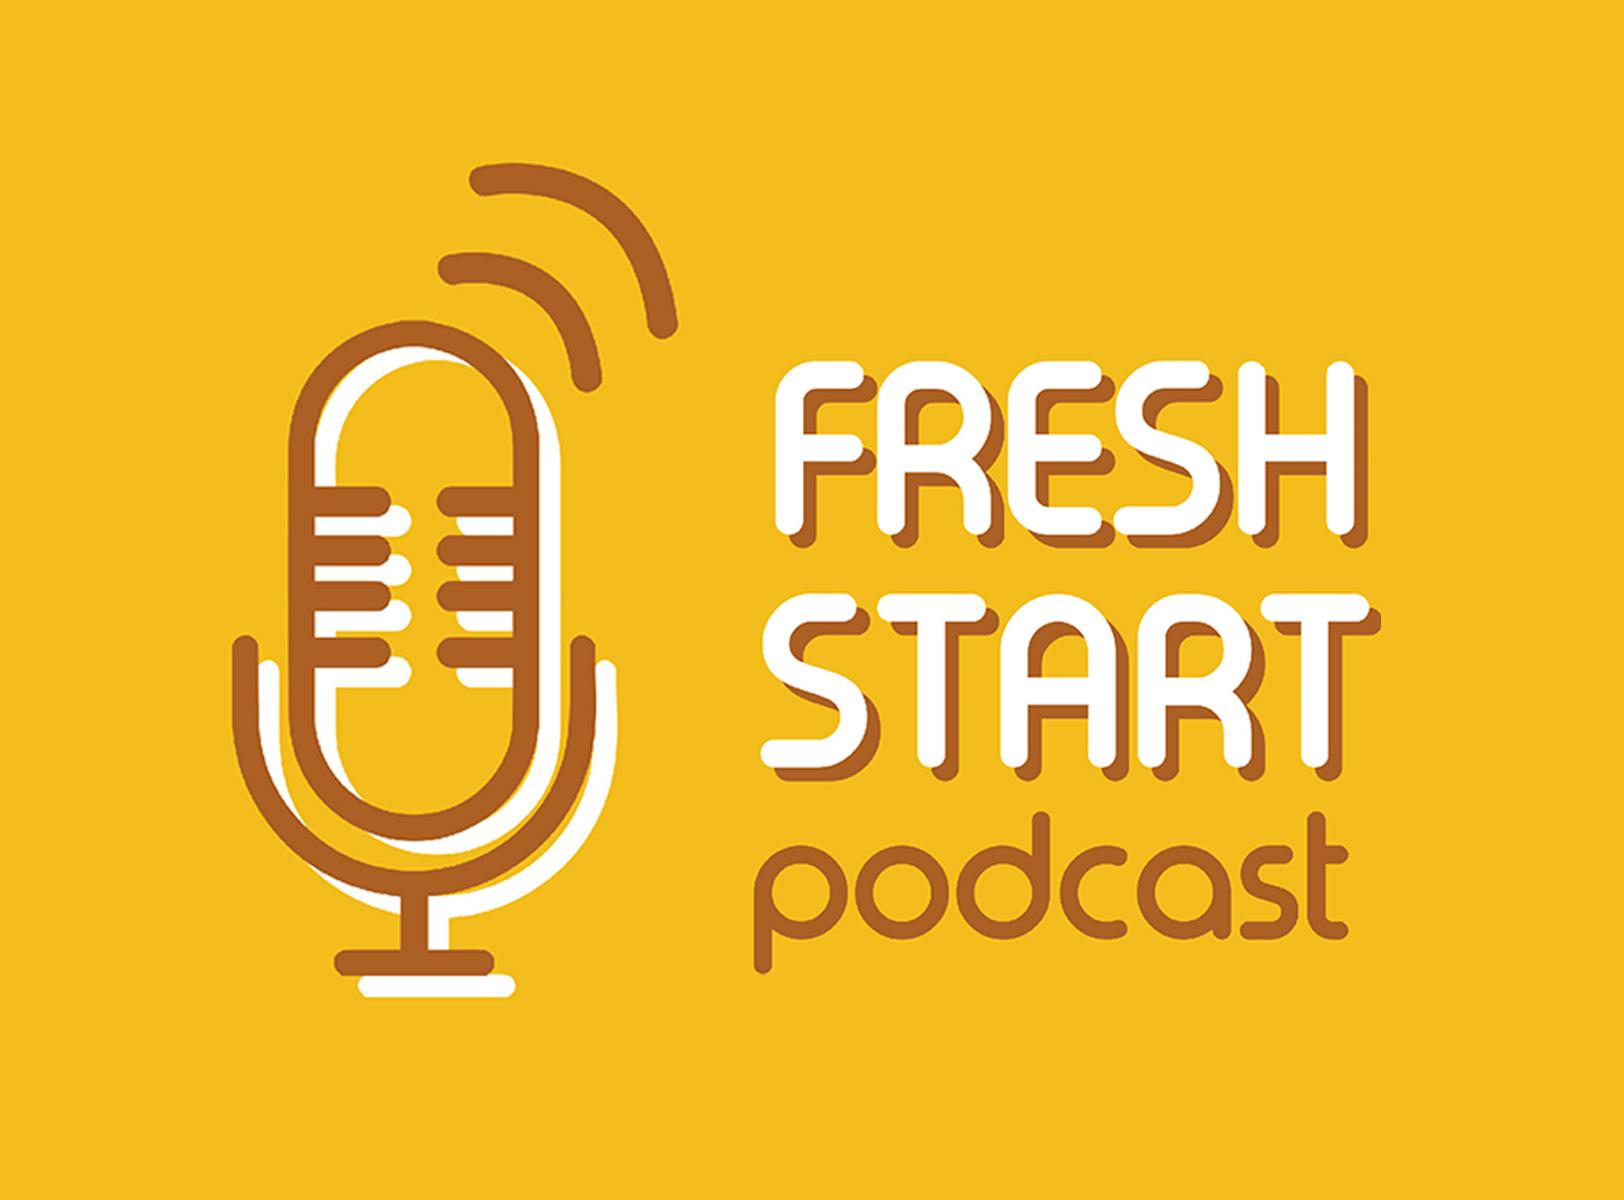 Fresh Start: Podcast News (10/21/2019 Mon.)